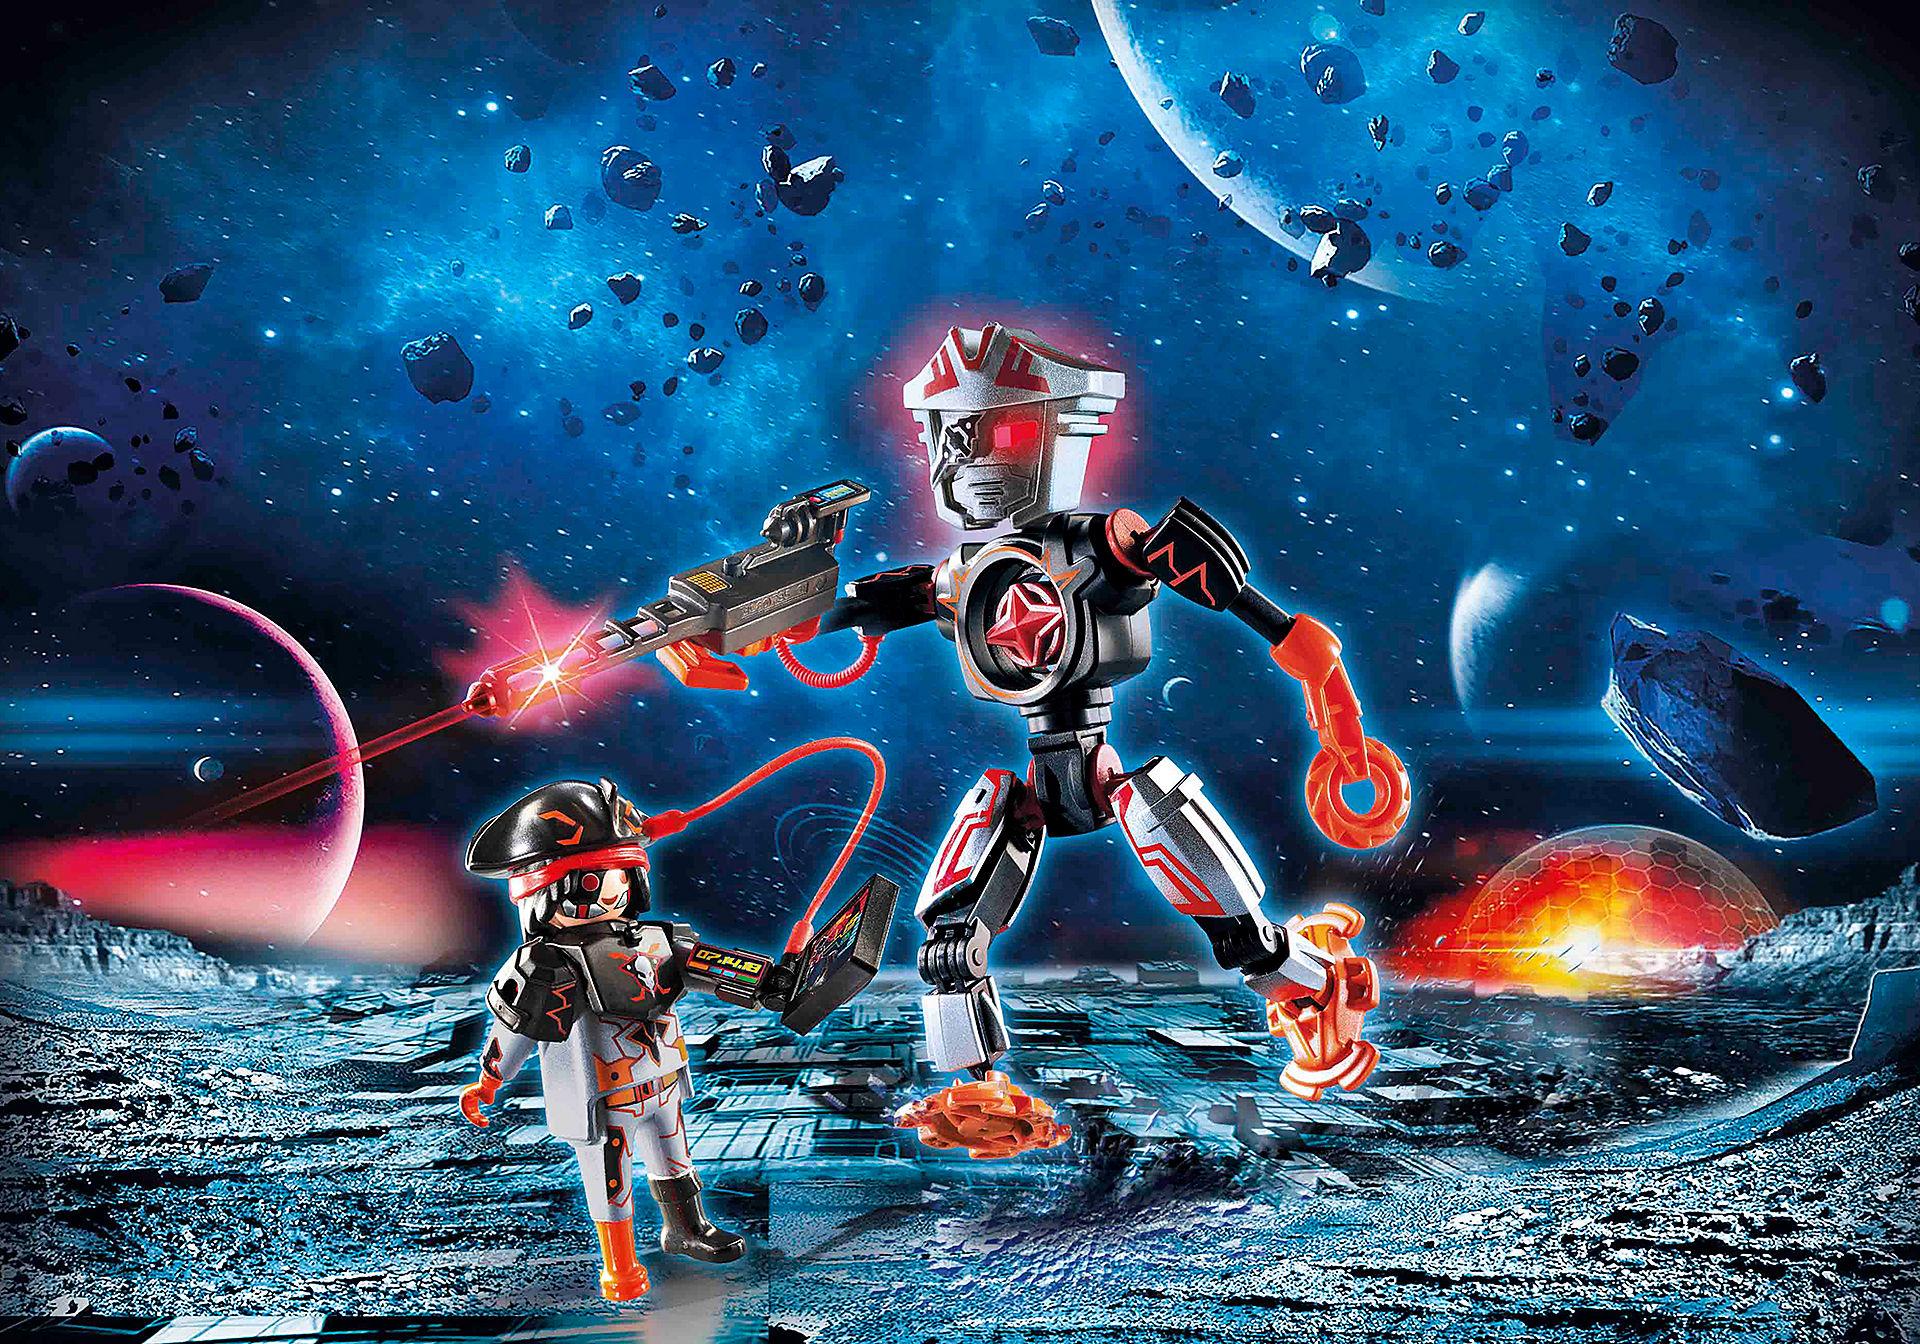 70024 Galaxy piratenrobot zoom image1